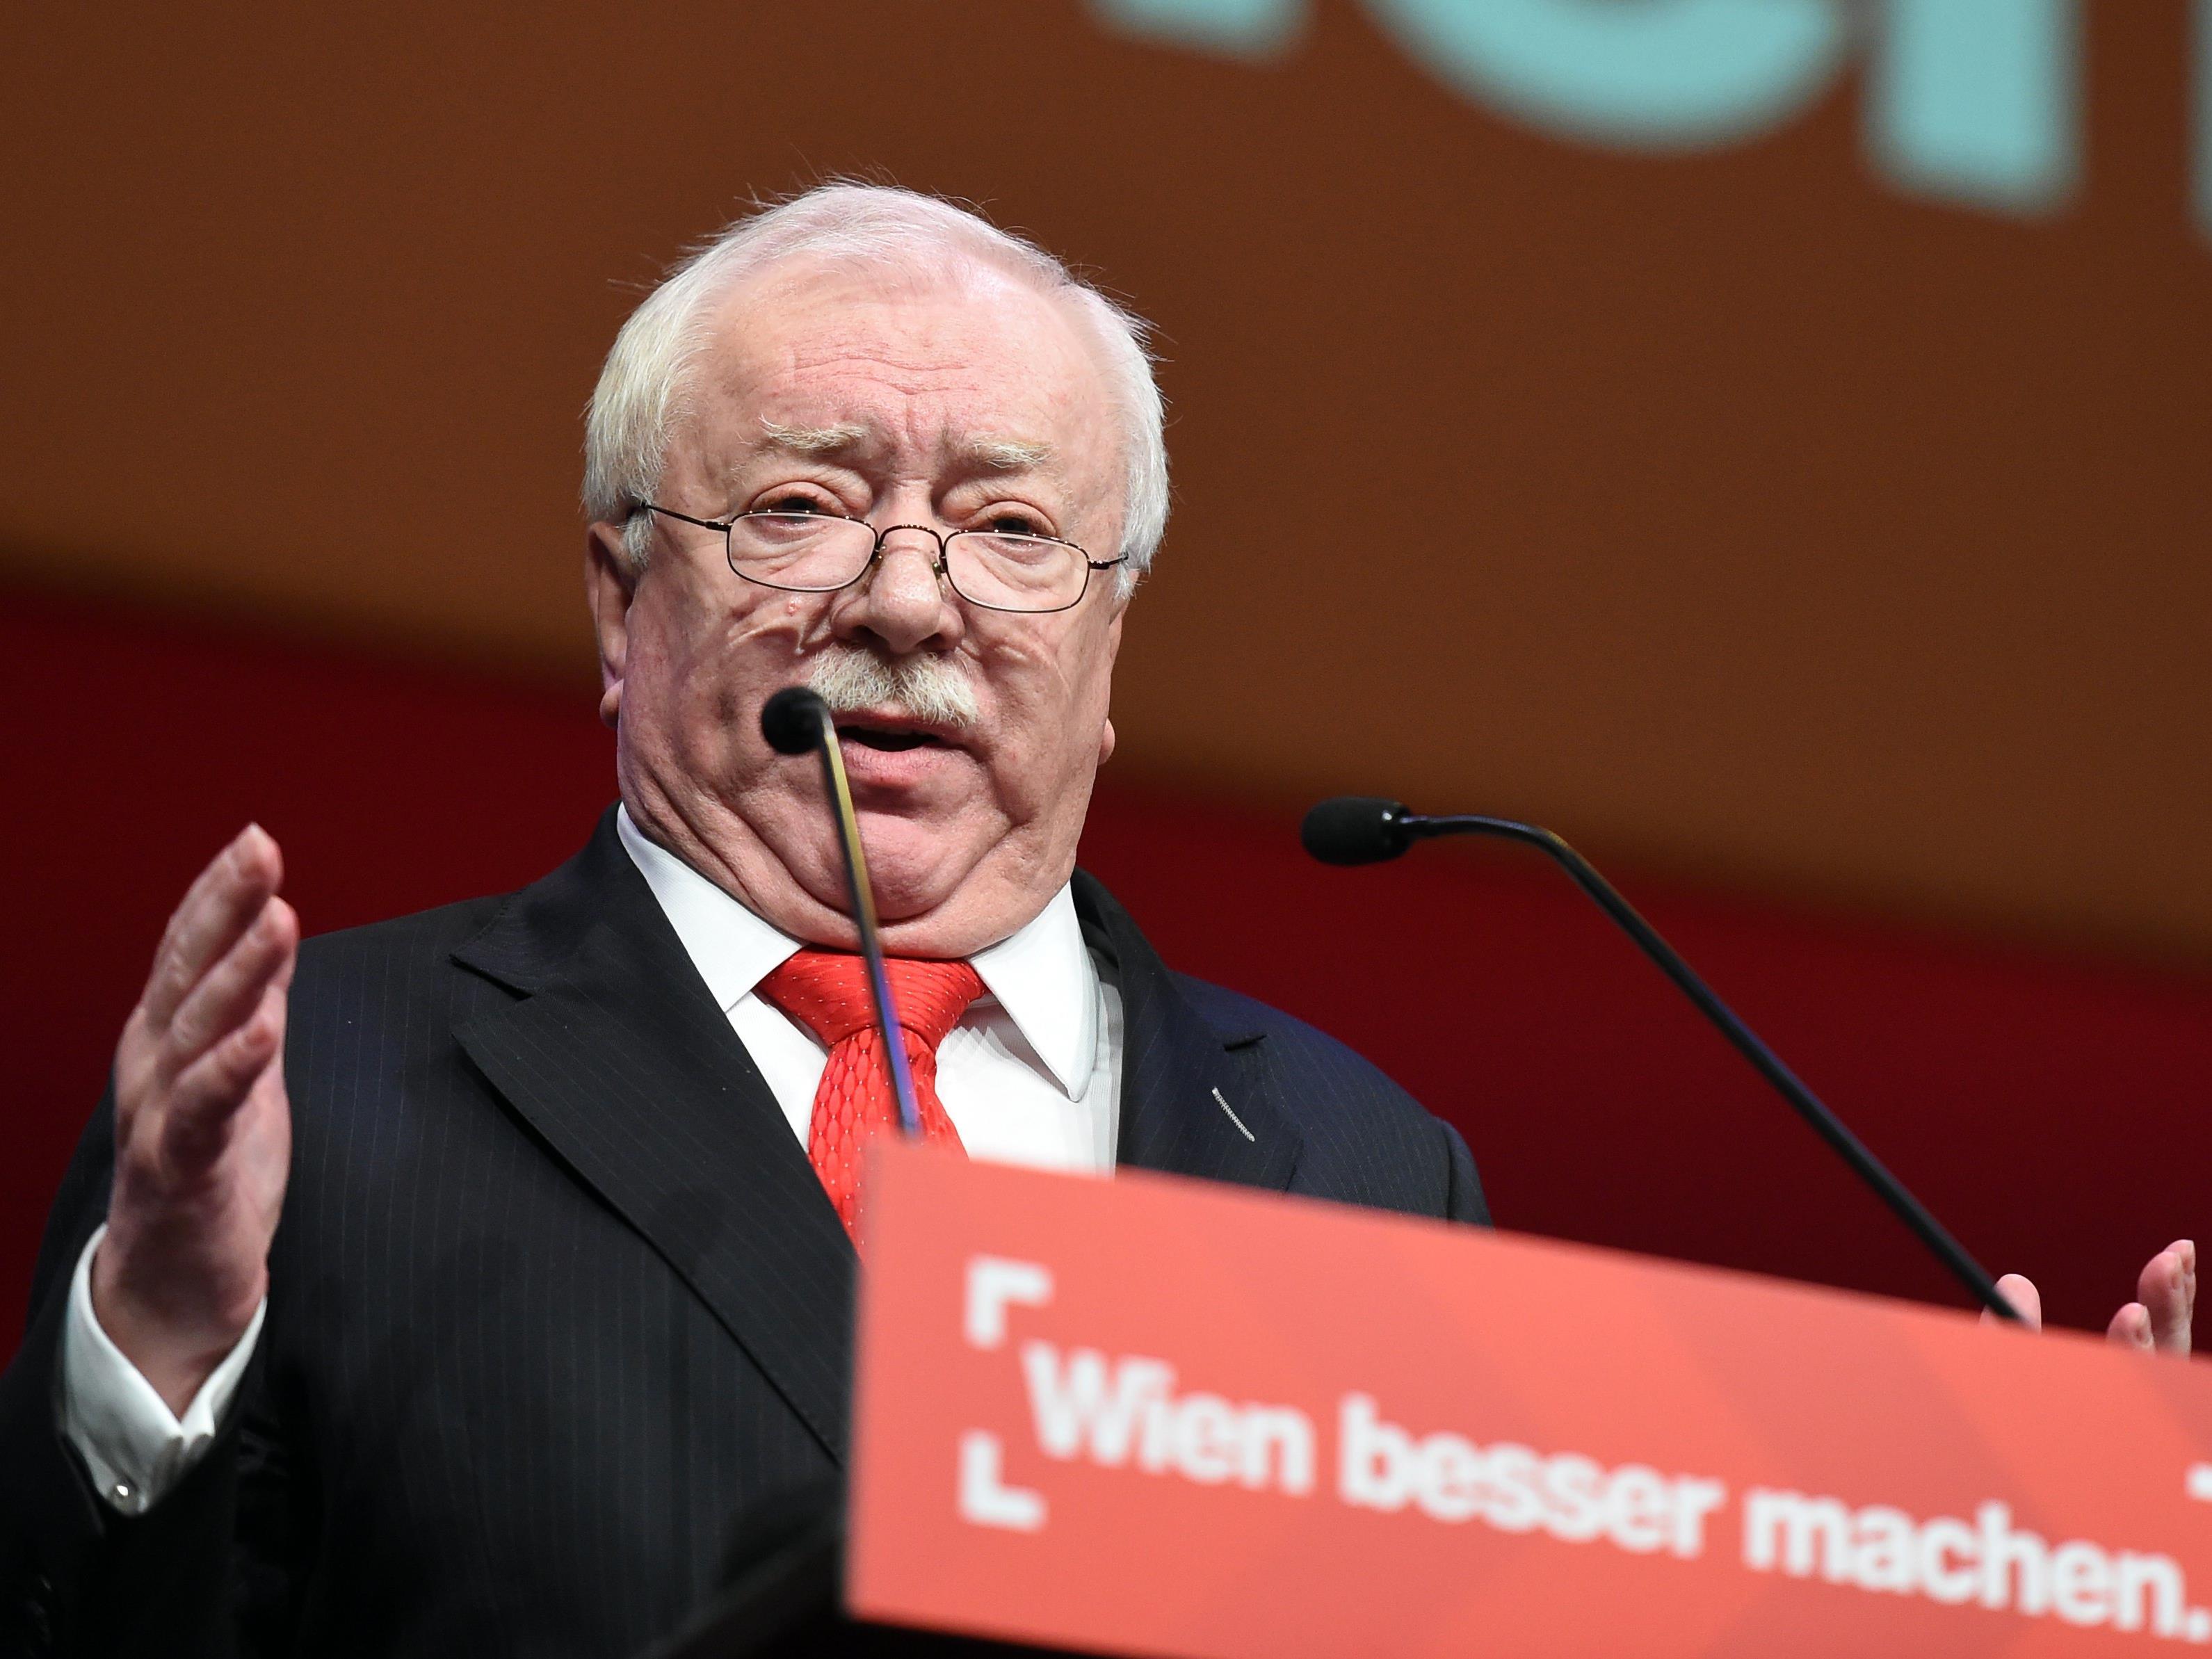 Wiens Bürgermeister Michael Häupl beim SPÖ-Parteitag